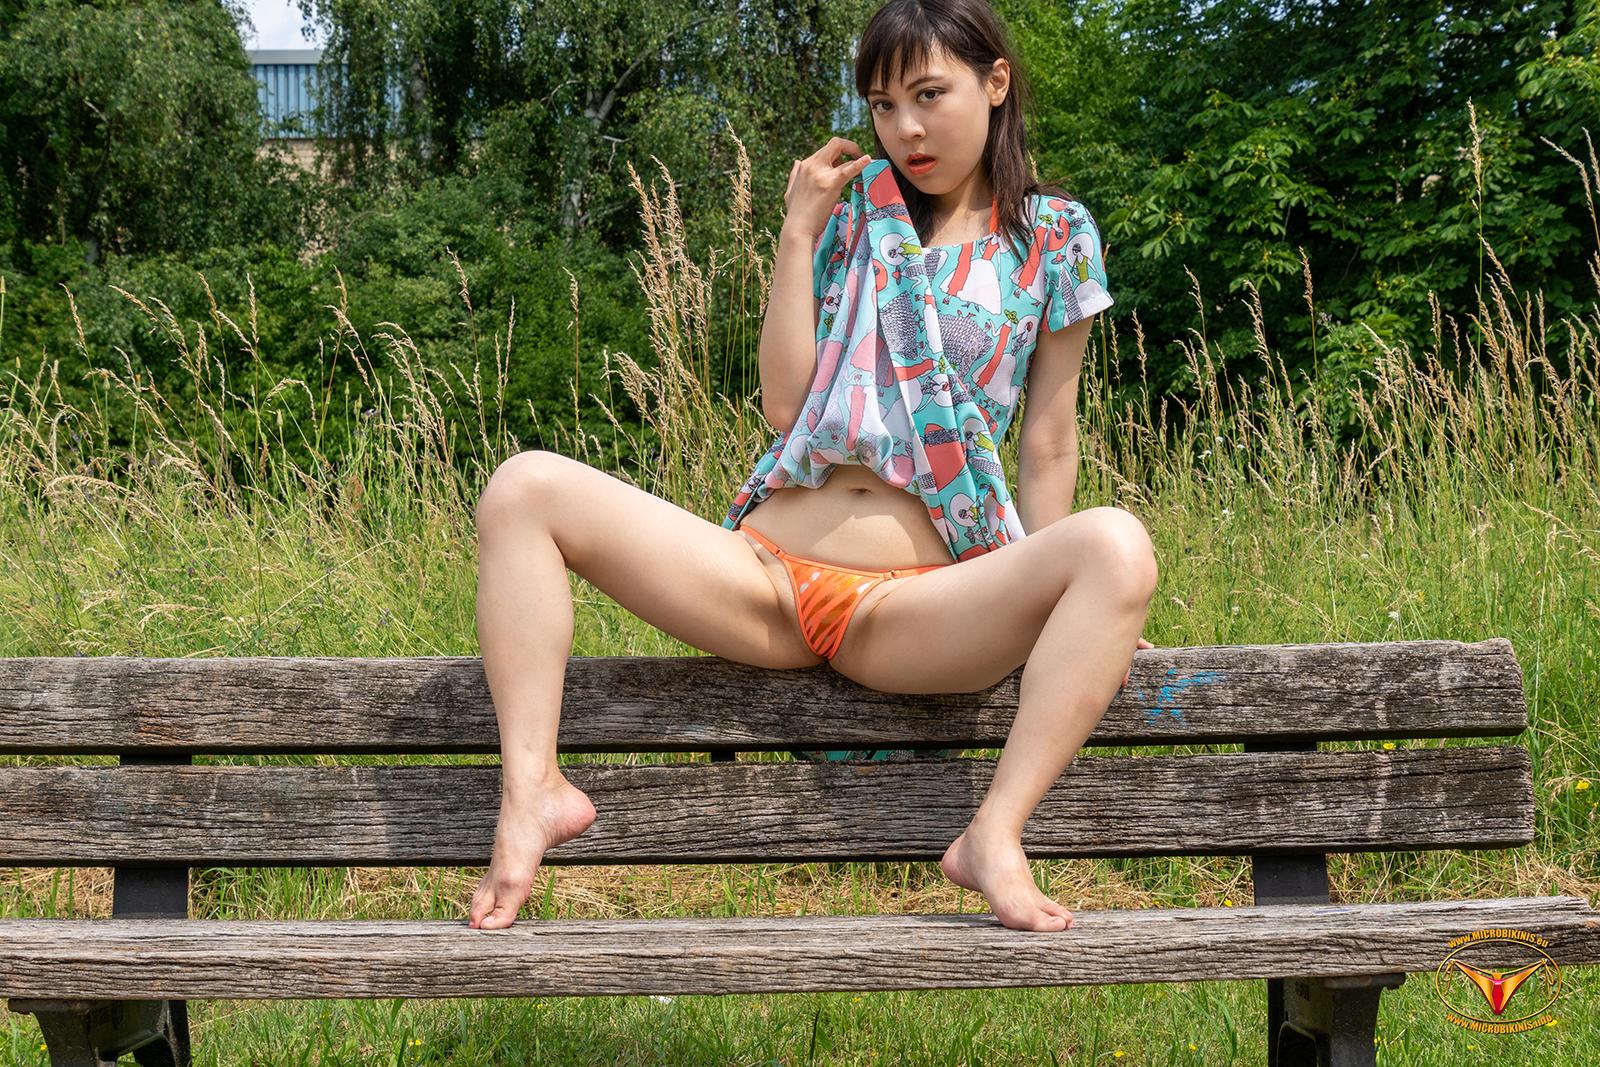 Yuli Hung